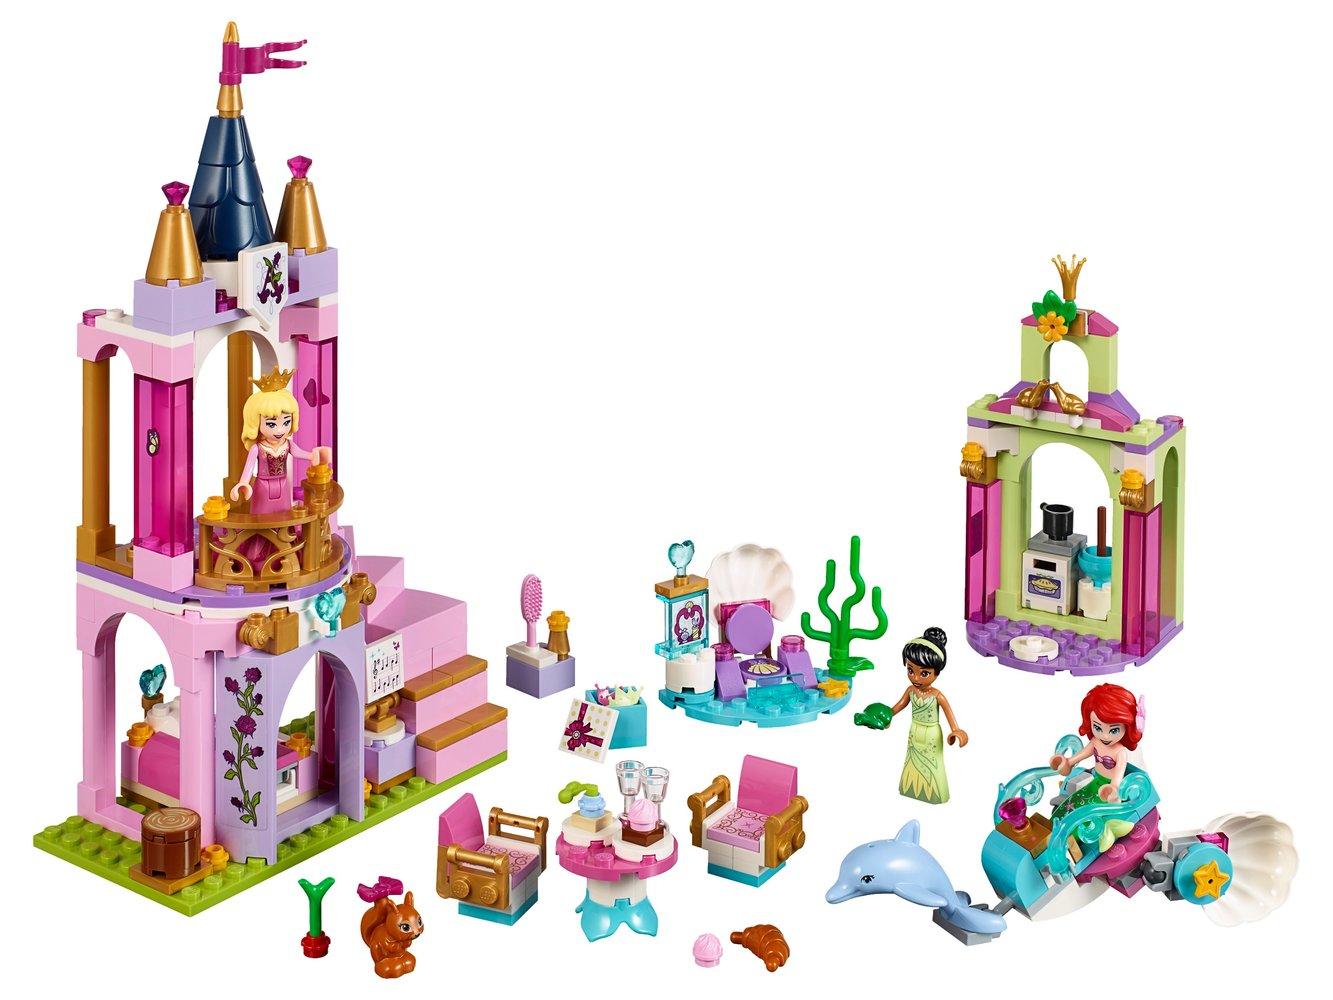 Ariel, Aurora, and Tiana's Royal Celebration